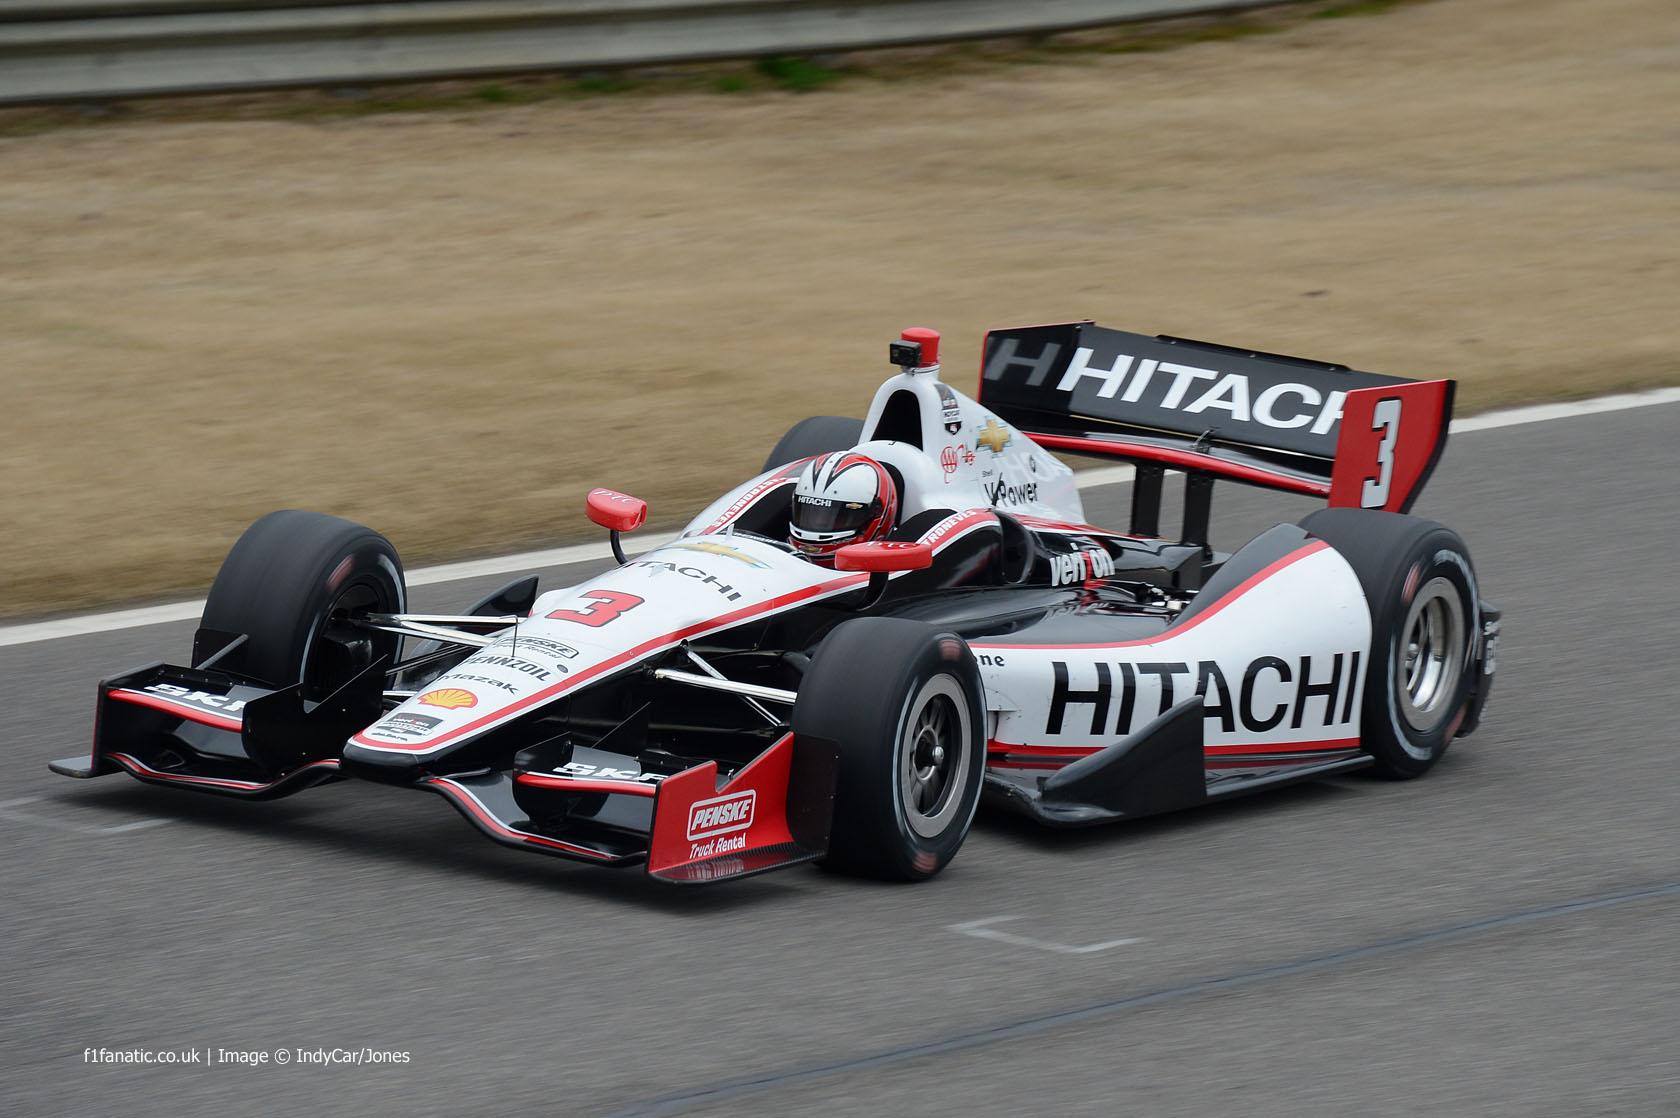 Helio Castroneves, Penske, Barber Motorsport Park, 2014